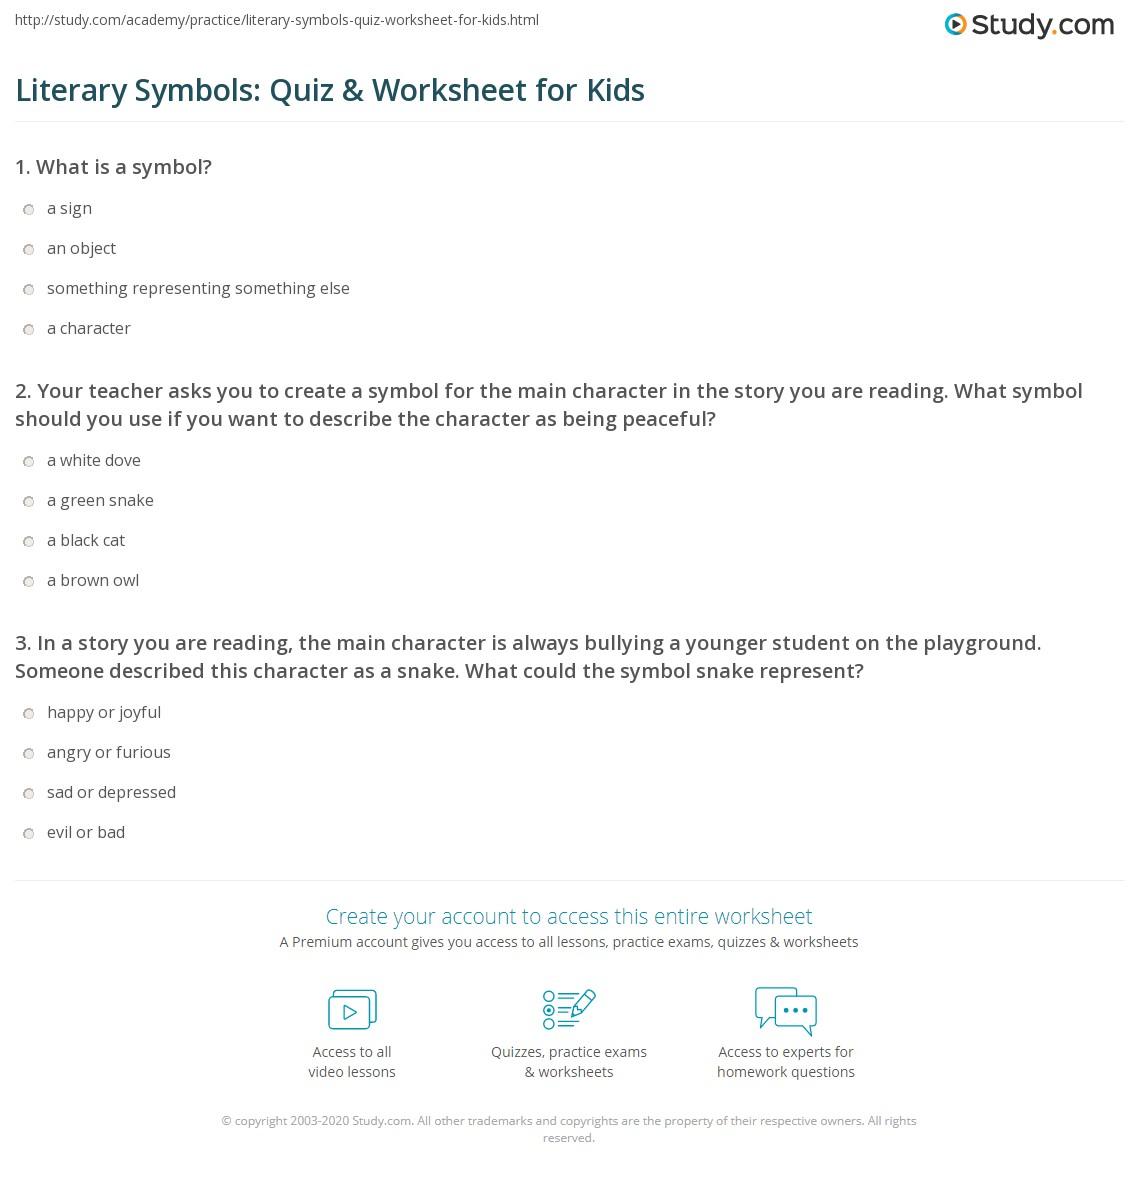 Literary Symbols Quiz Worksheet For Kids Study